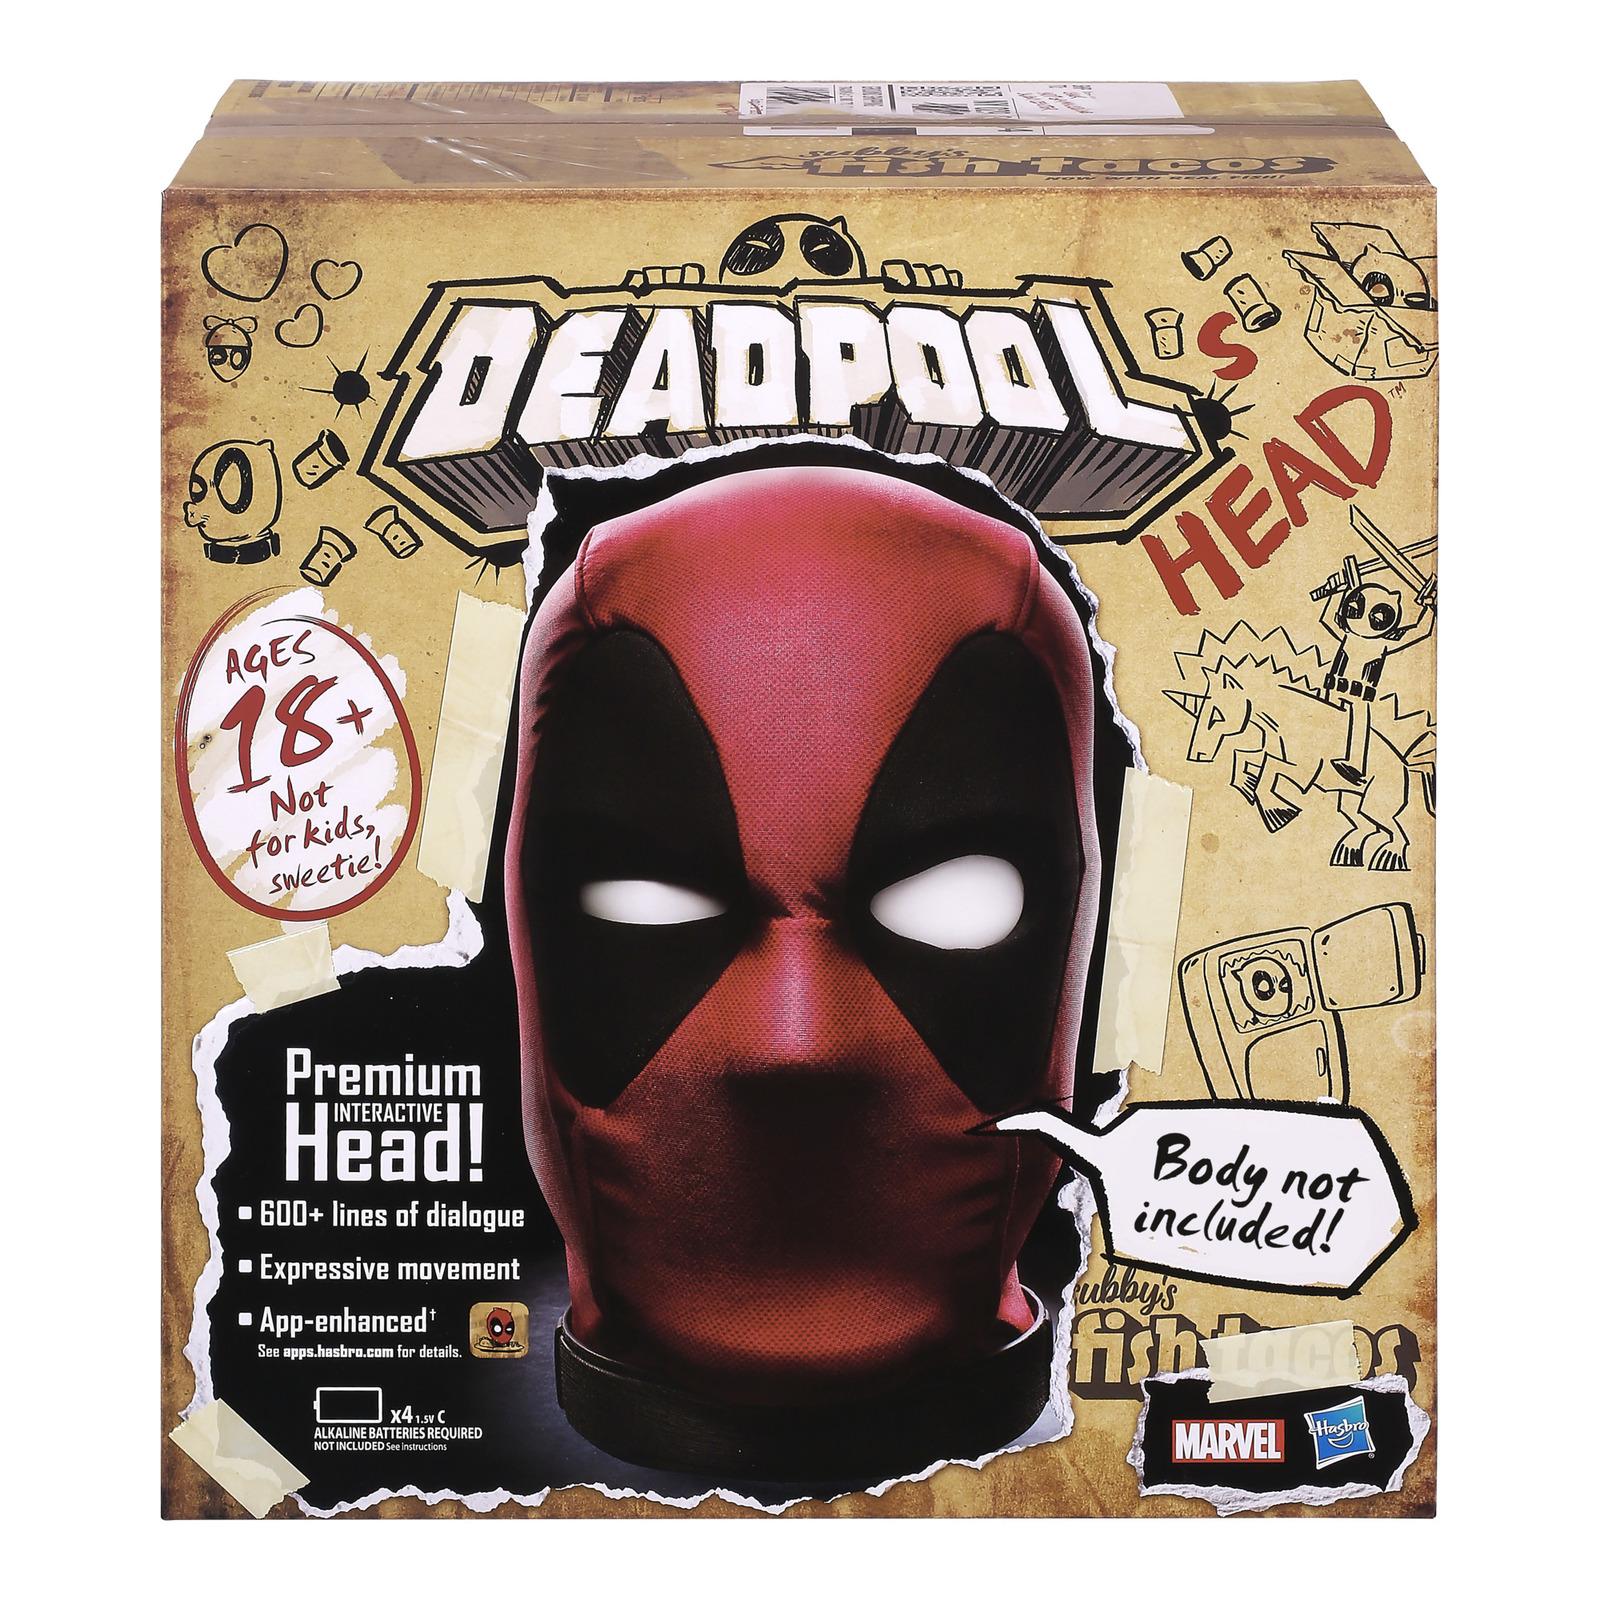 Marvel Legends: Deadpool's Head - Premium Interactive Replica image